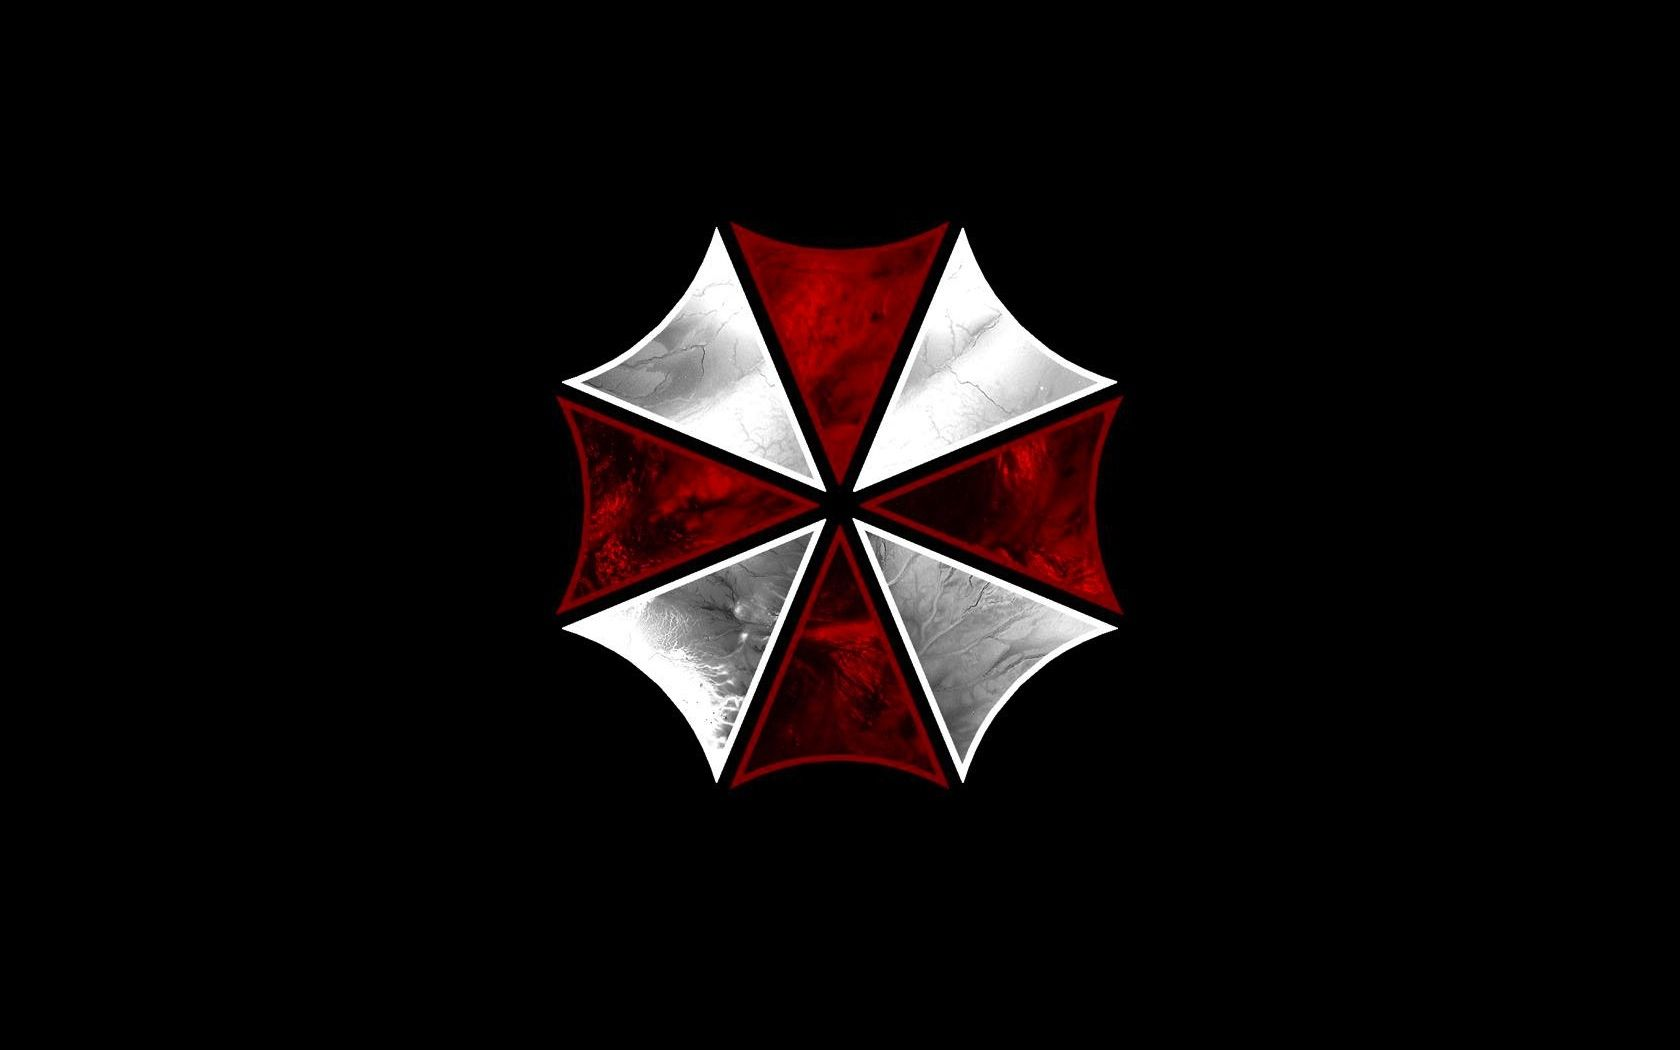 Resident Evil Umbrella Corp Black Background 1680x1050 Wallpaper